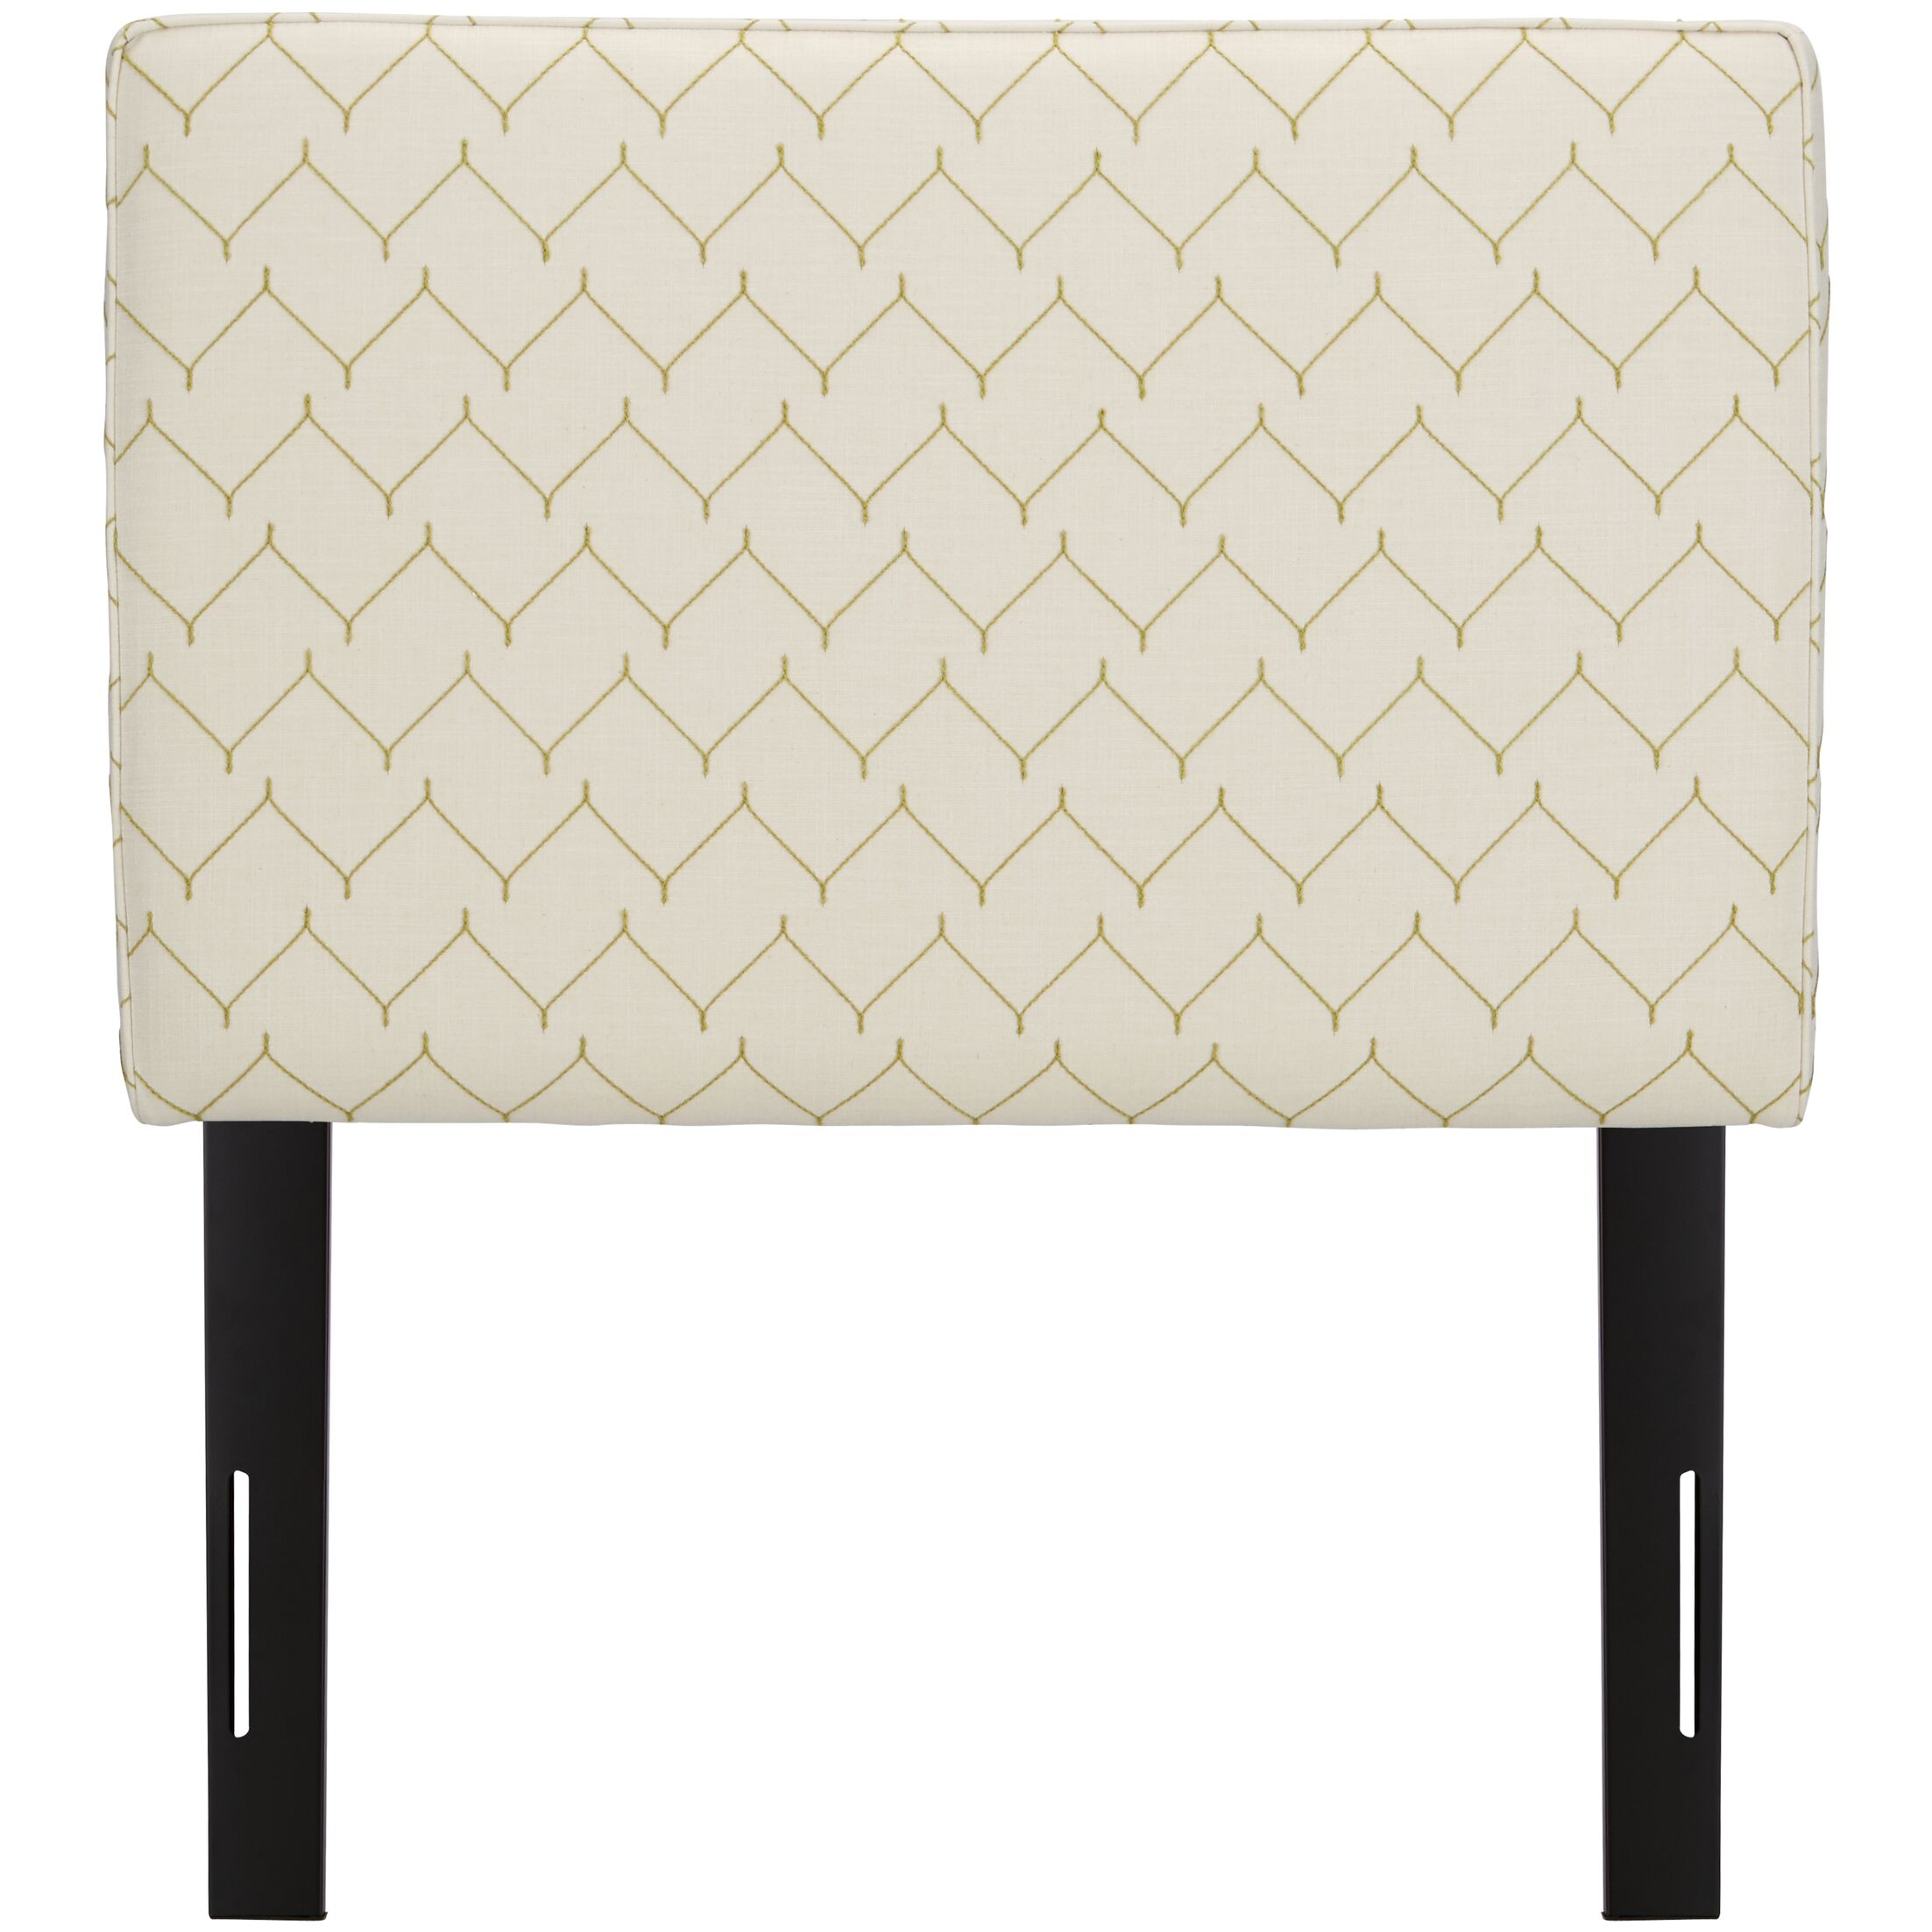 Patchway Box Seam Upholstered Panel Headboard Size: Twin, Upholstery: Panama